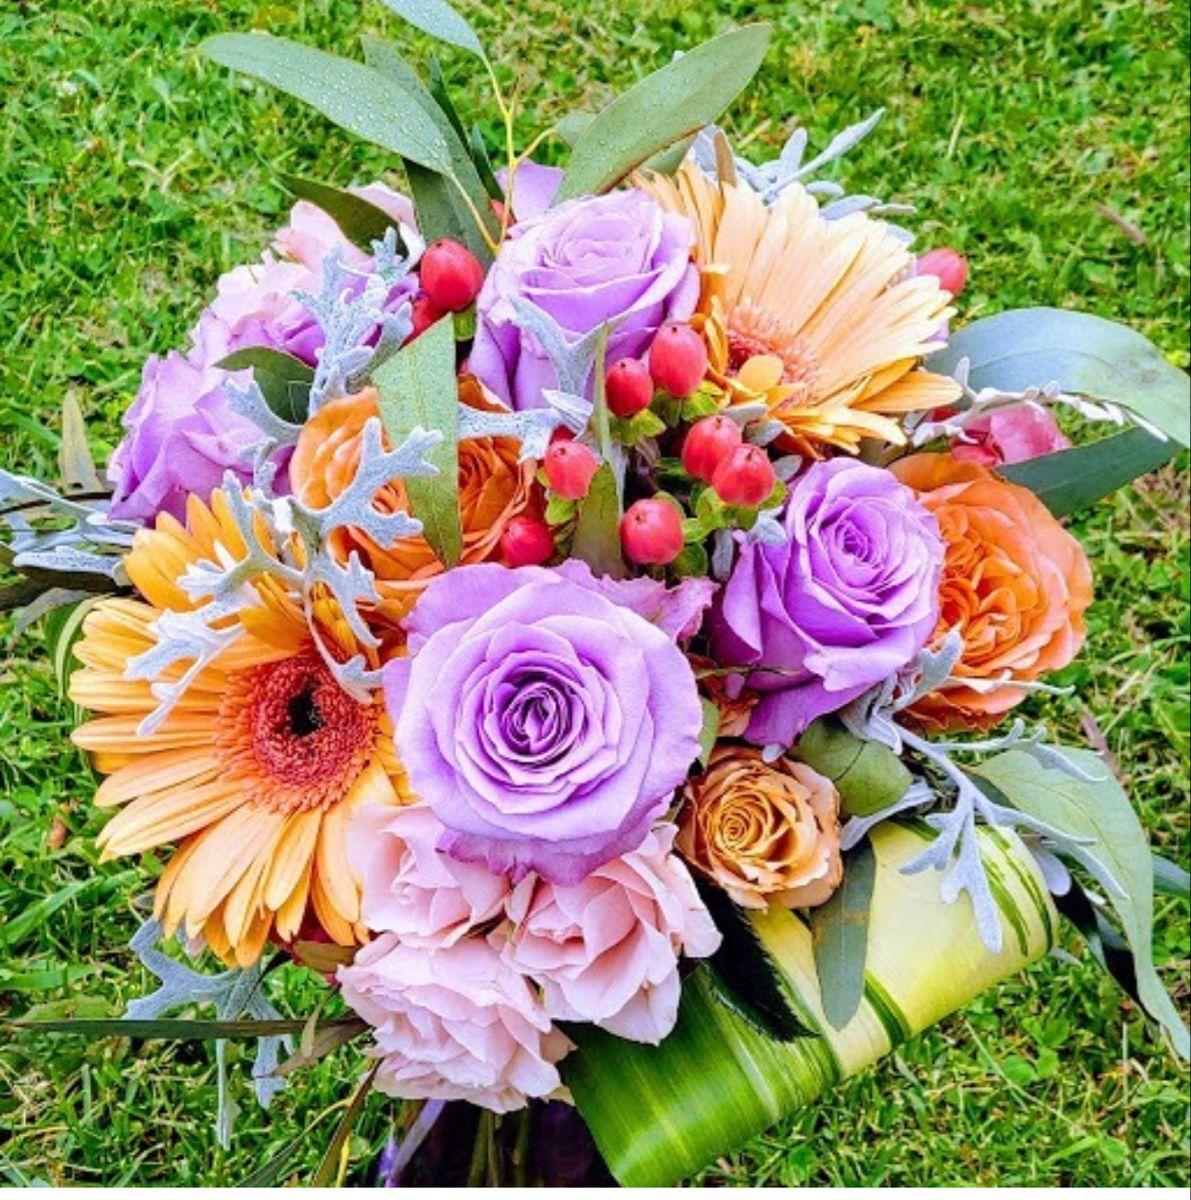 Lavender Roses In 2020 Online Wedding Flowers Lavender Roses Wholesale Roses